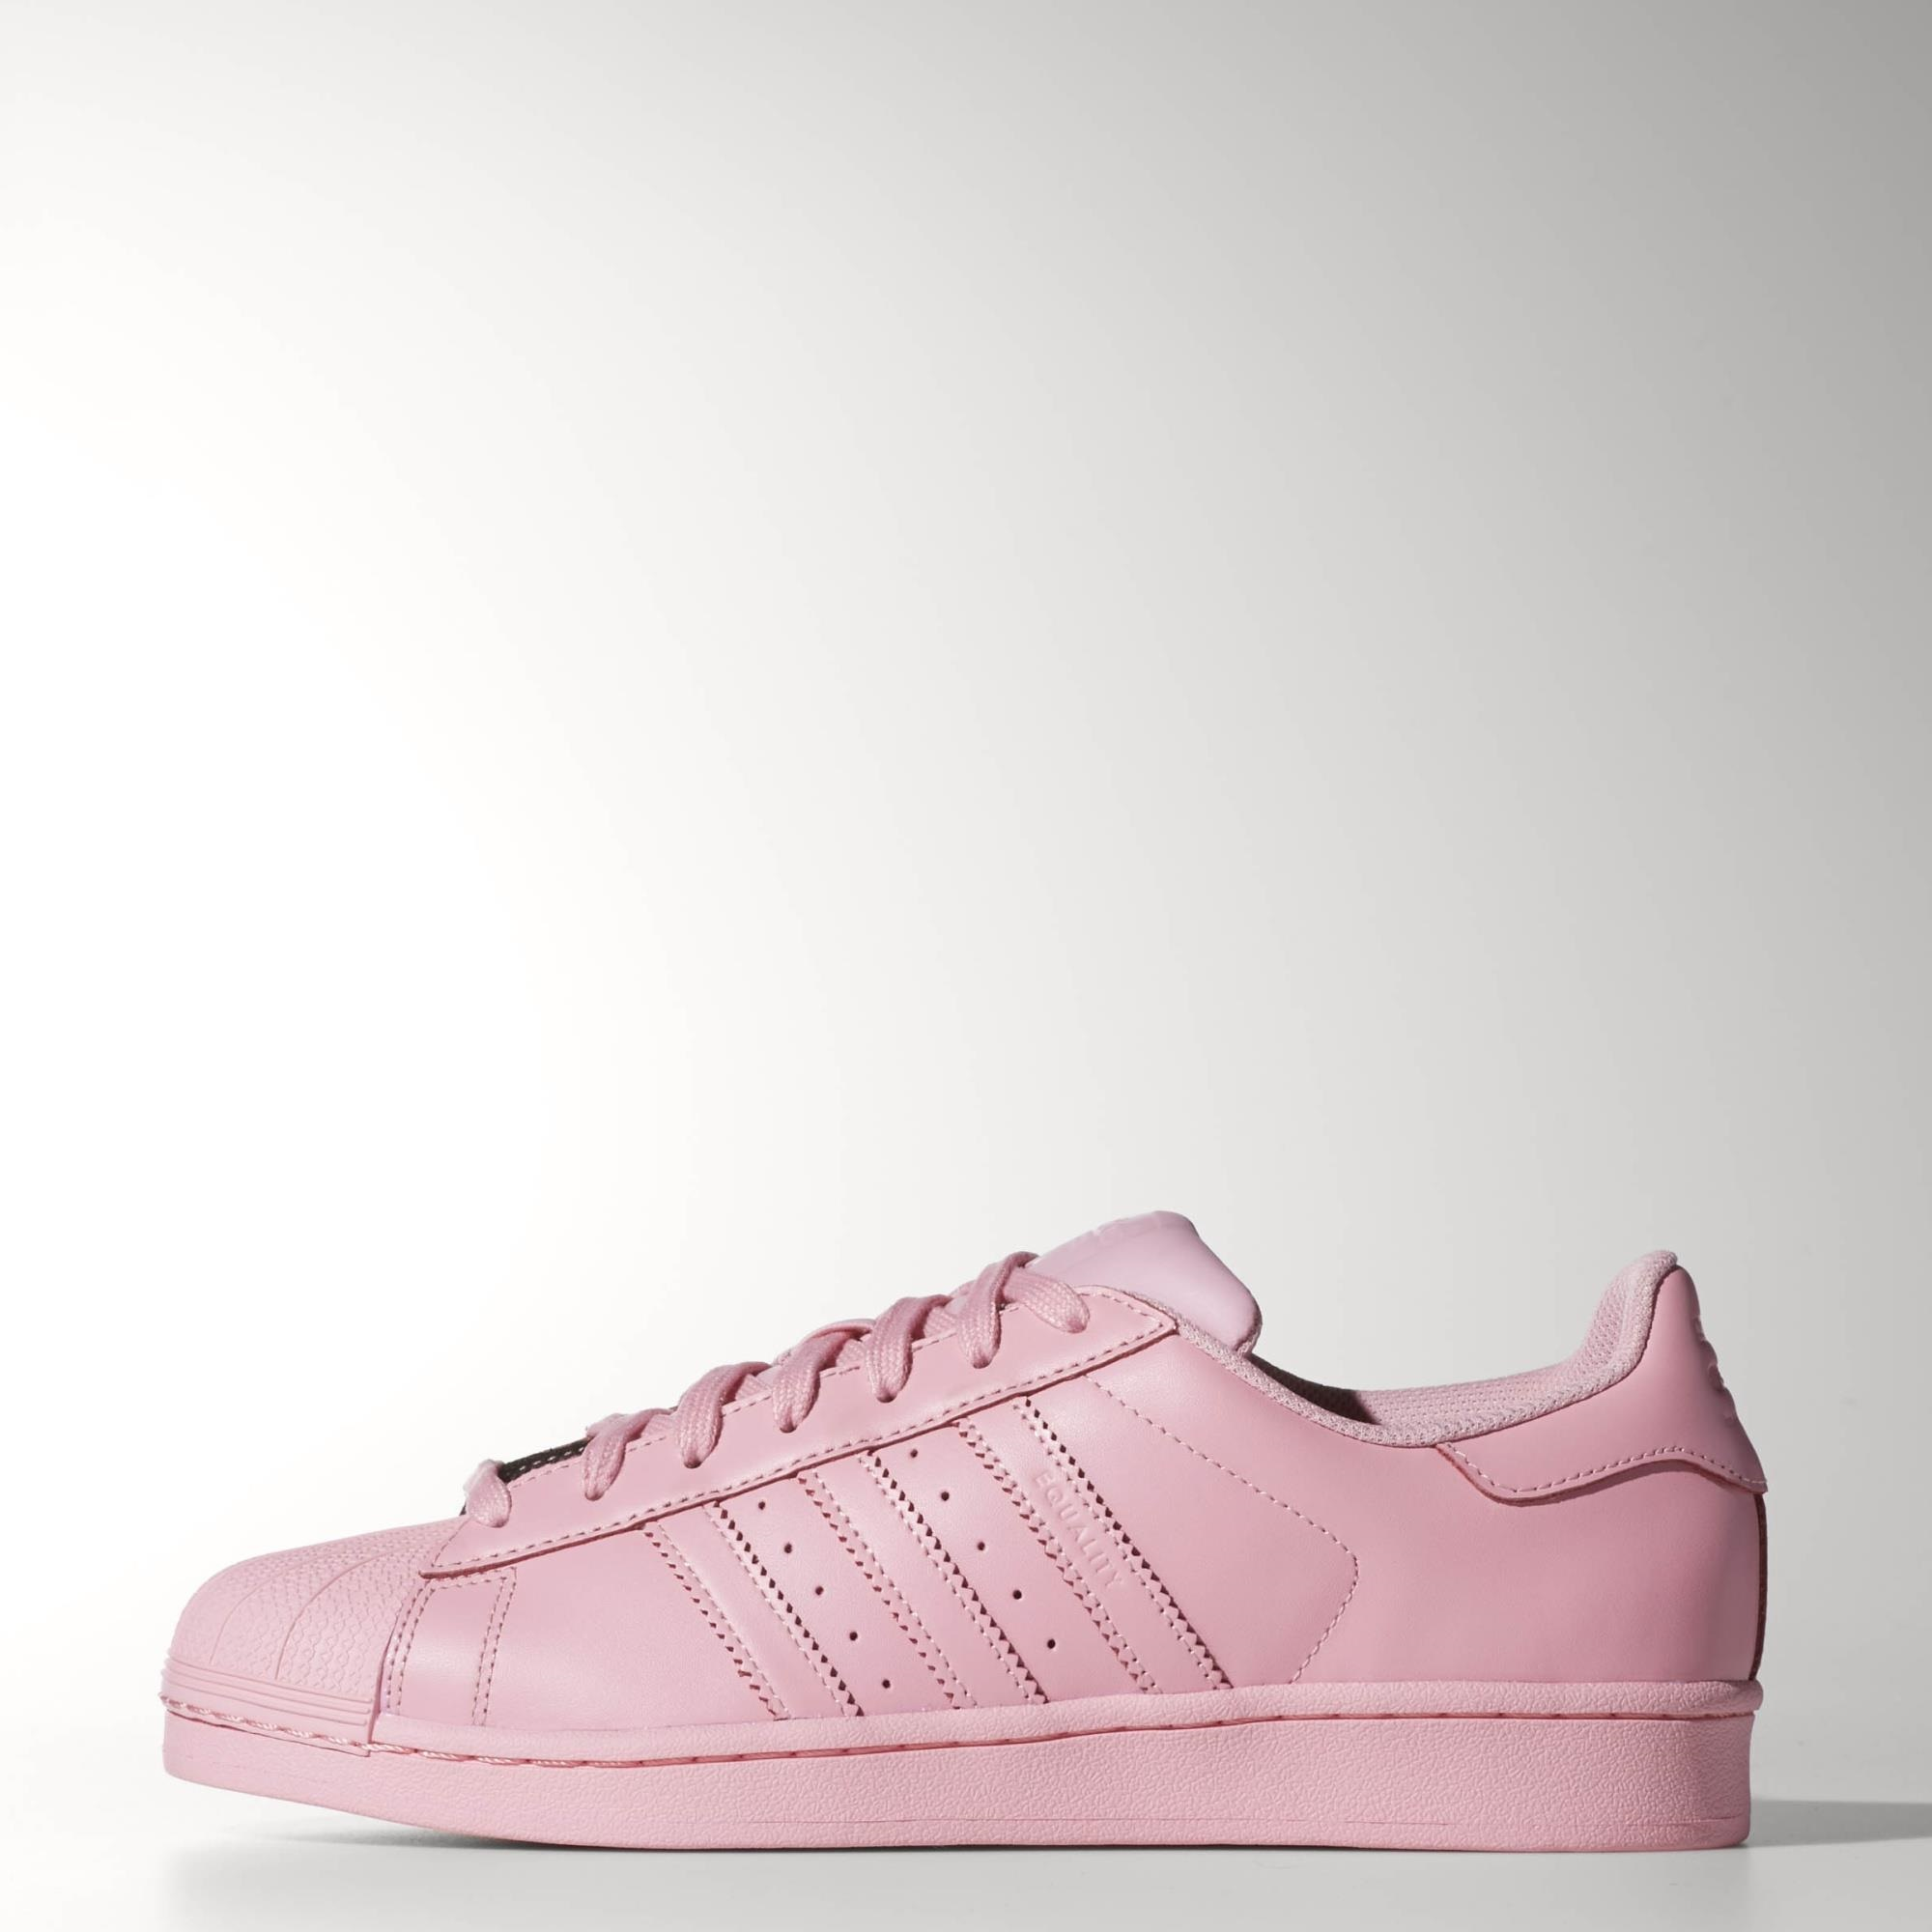 adidas Superstar Supercolor Shoes - Pink | adidas US